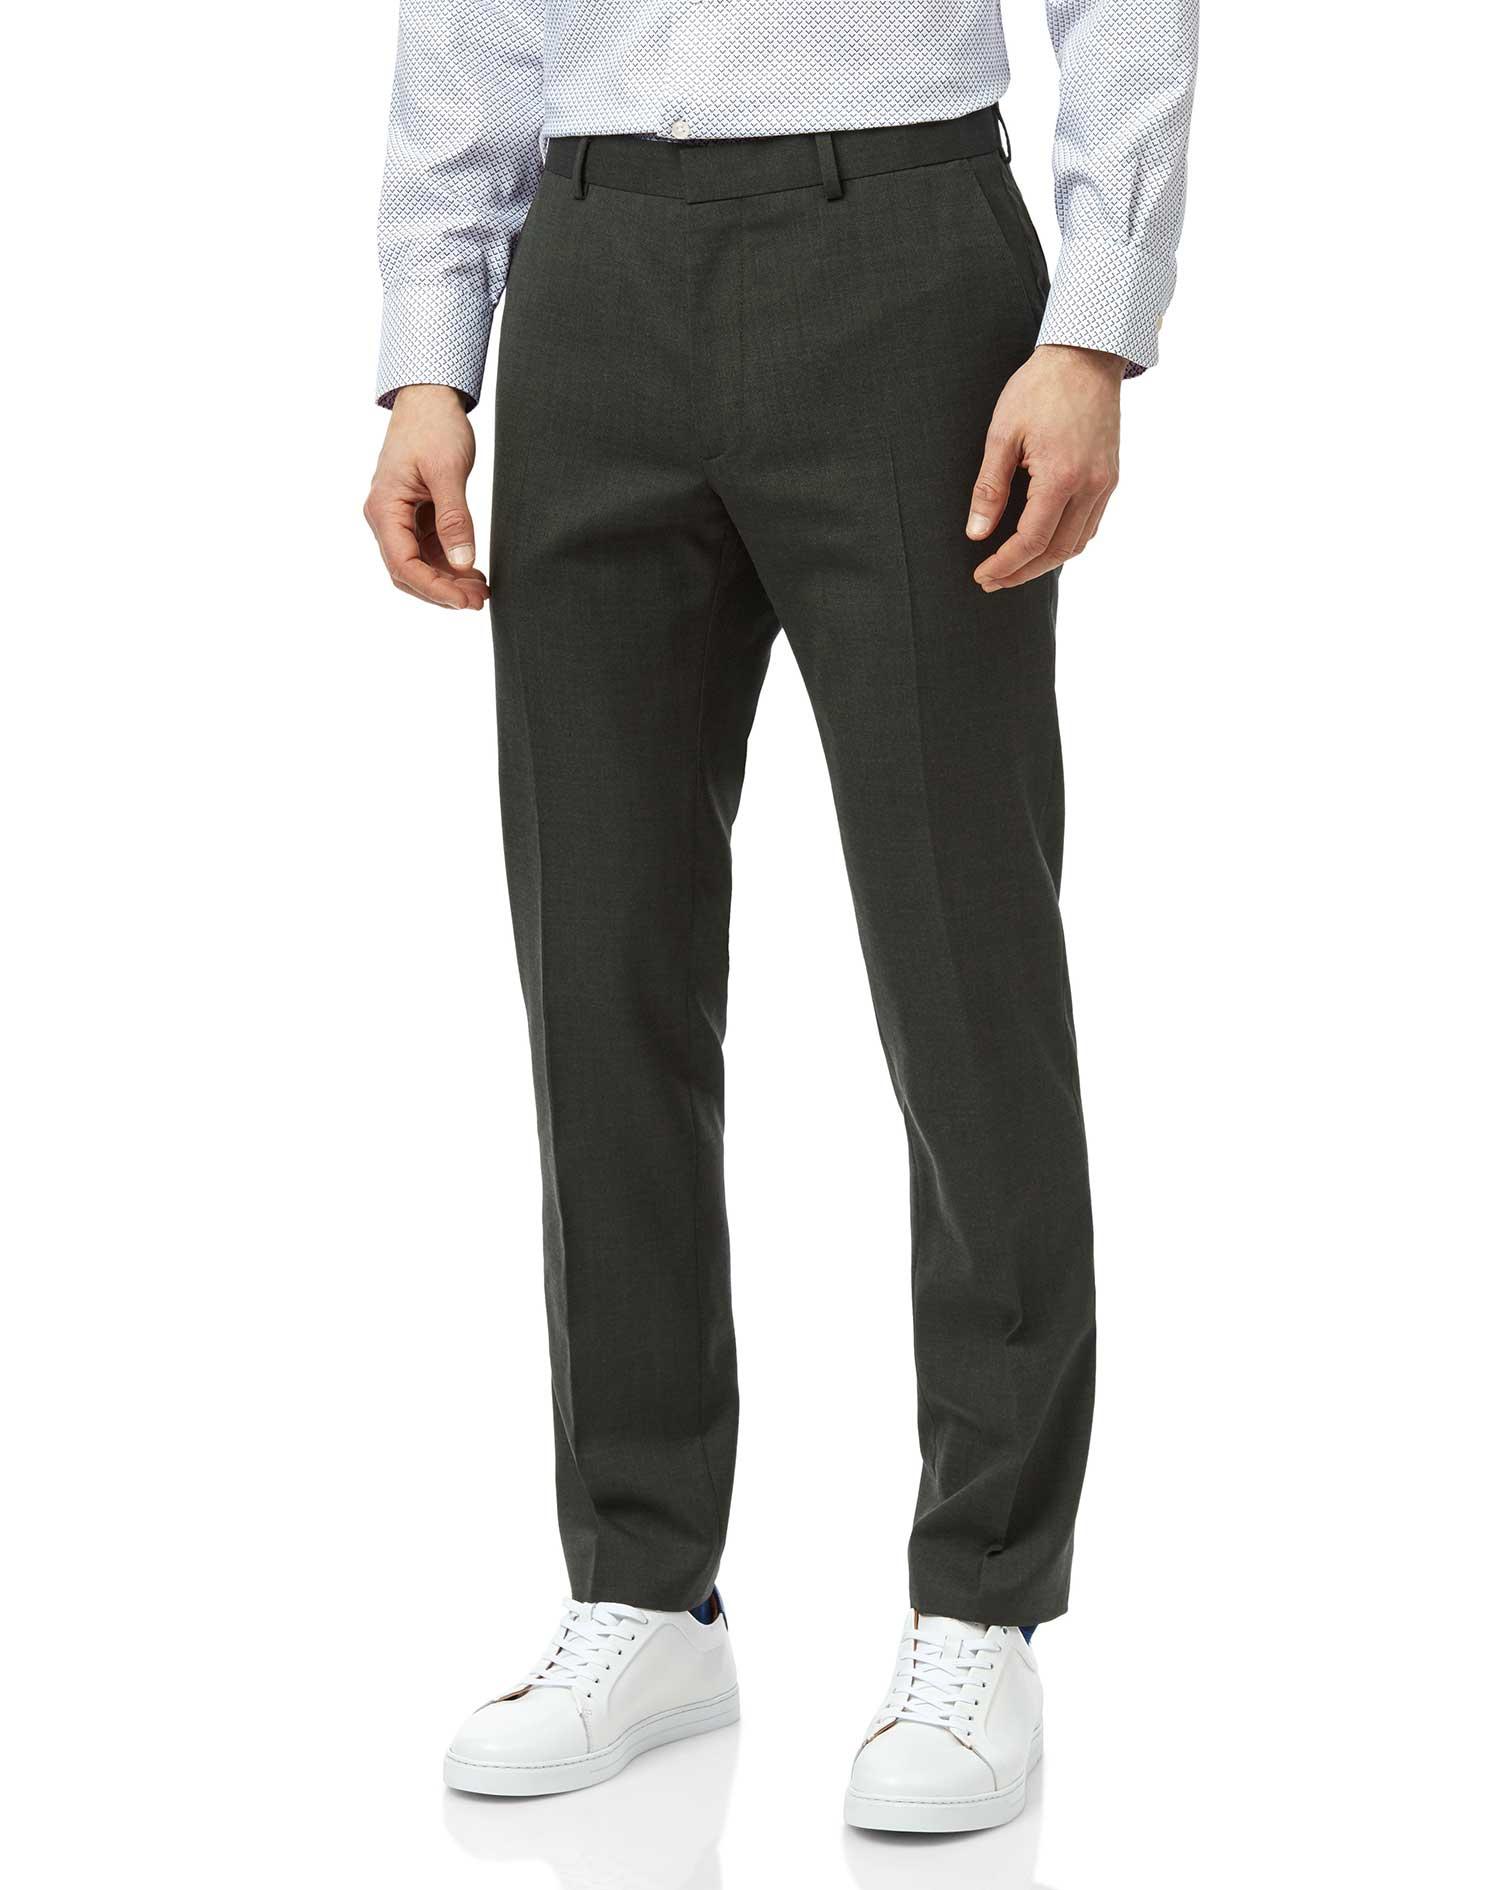 Wool Green Slim Fit Merino Business Suit Trousers